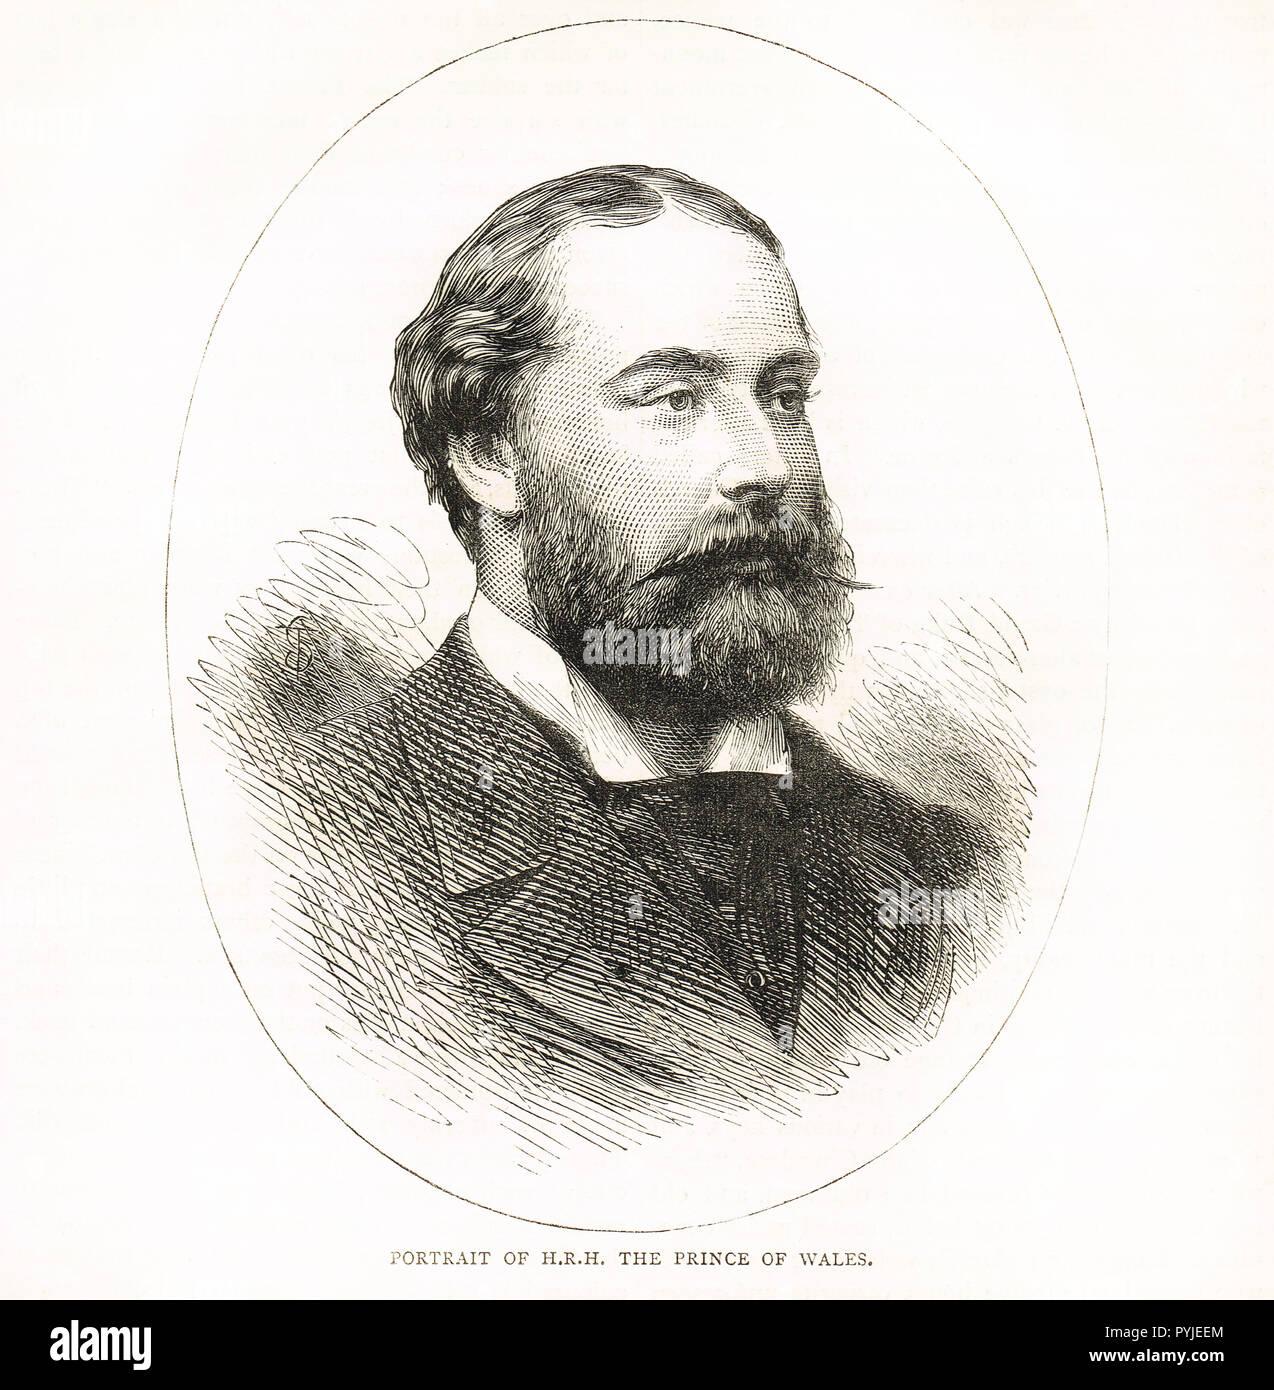 Prince Albert Edward, Prince of Wales, future King Edward VII, circa 1875 - Stock Image